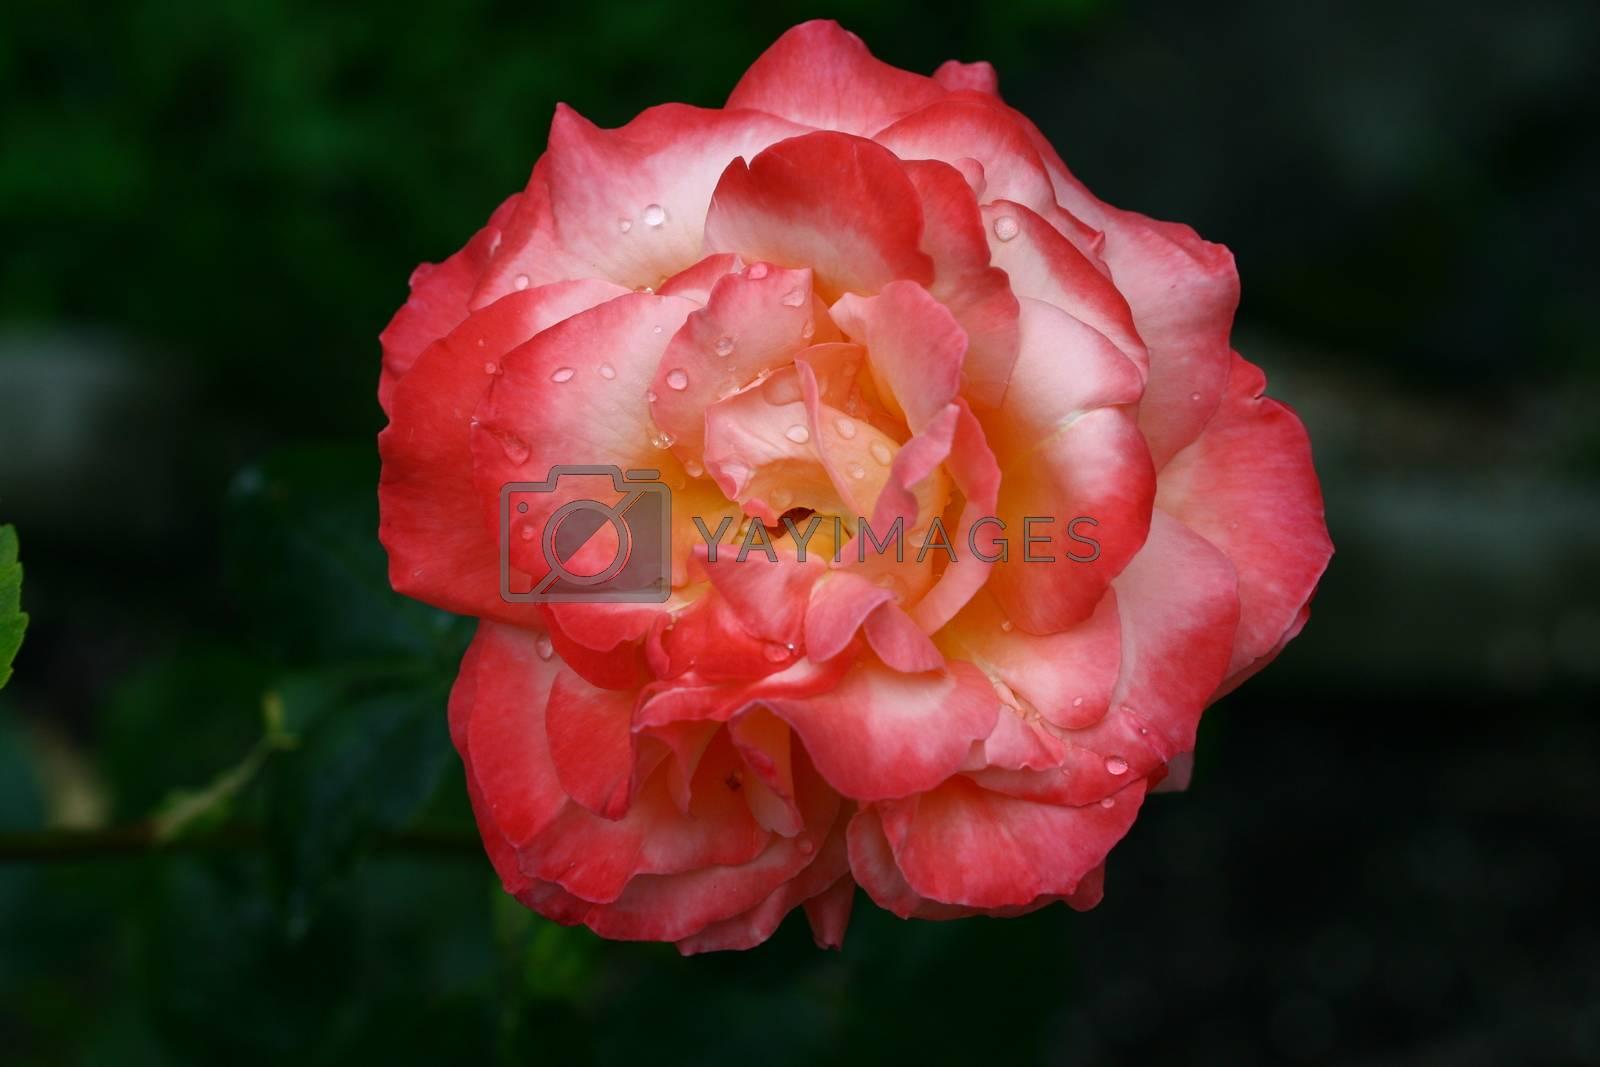 Rød rose i sol lys og flash